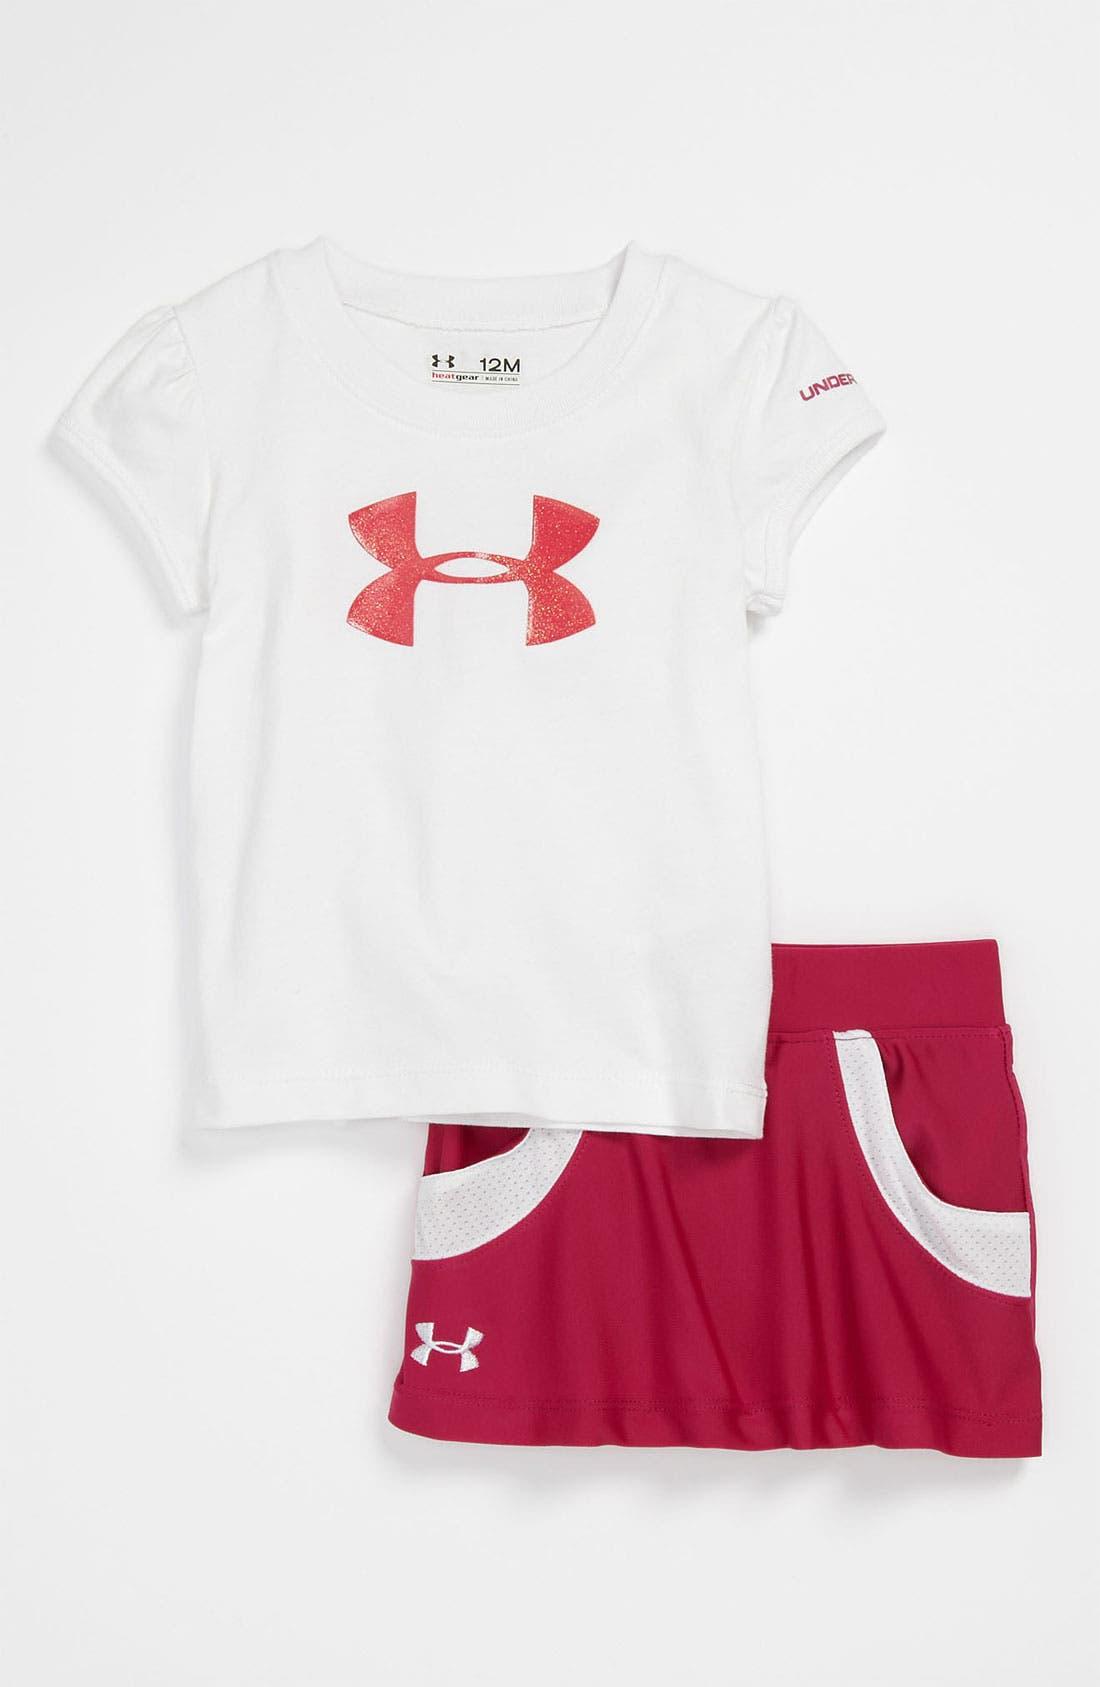 Main Image - Under Armour Shirt & Skirt (Infant)